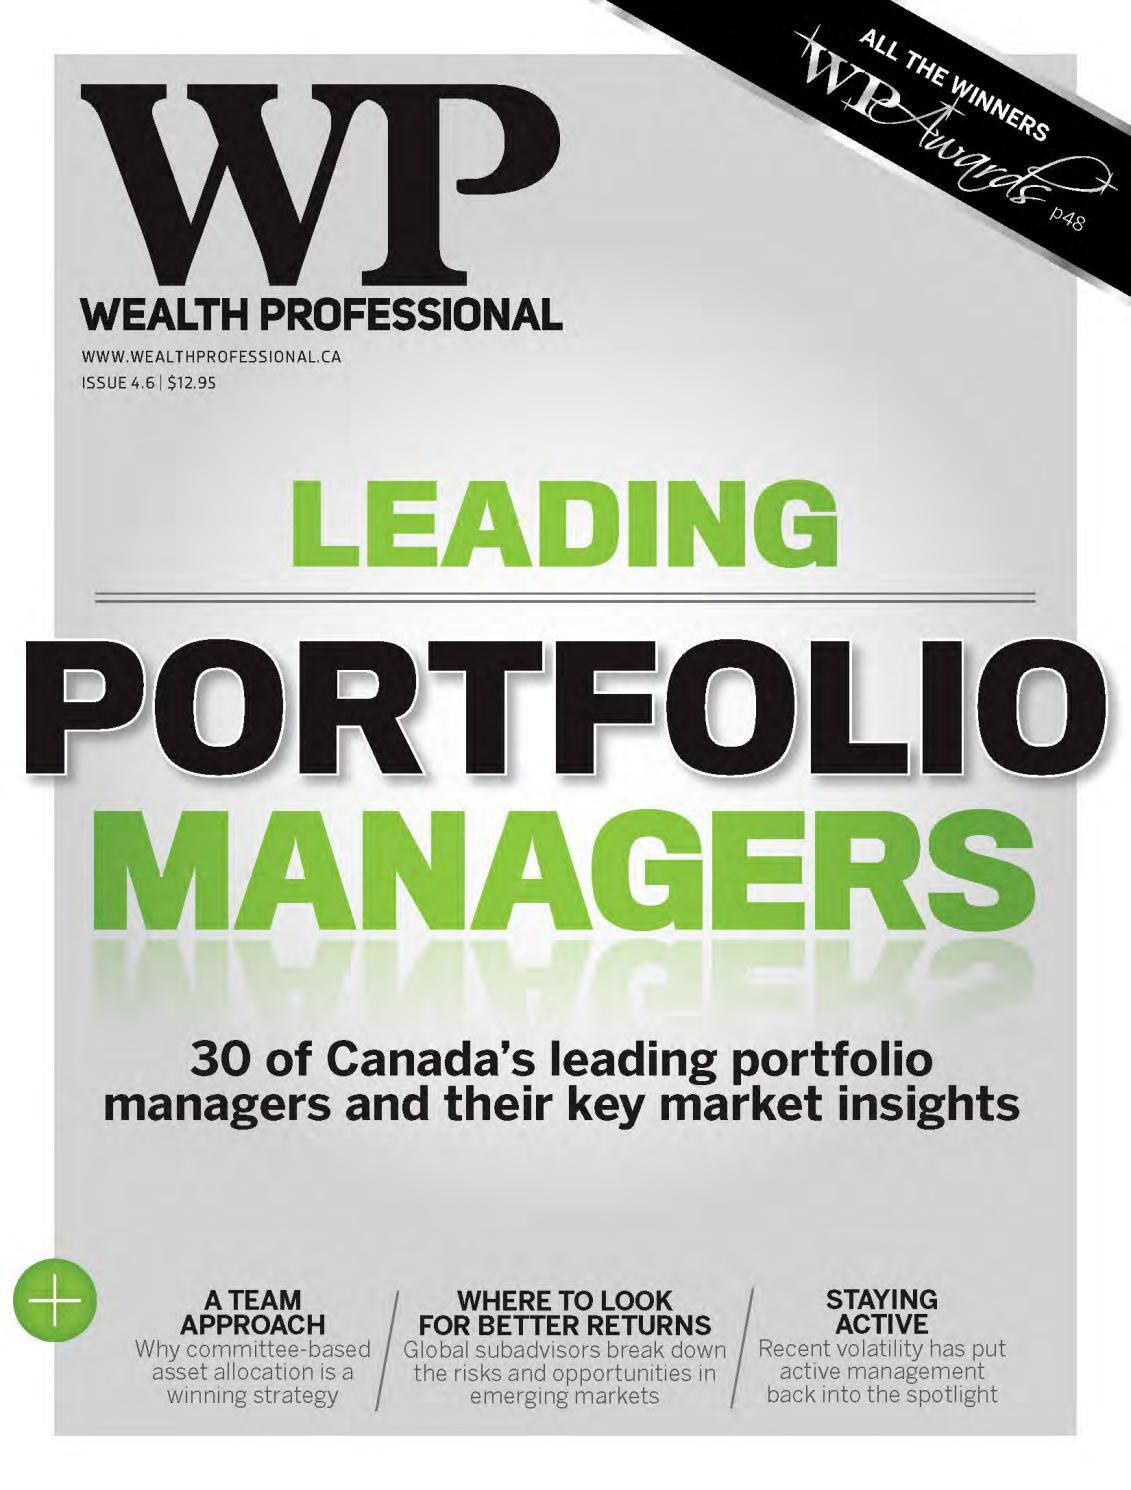 portfolio managers methodically search - HD1131×1490